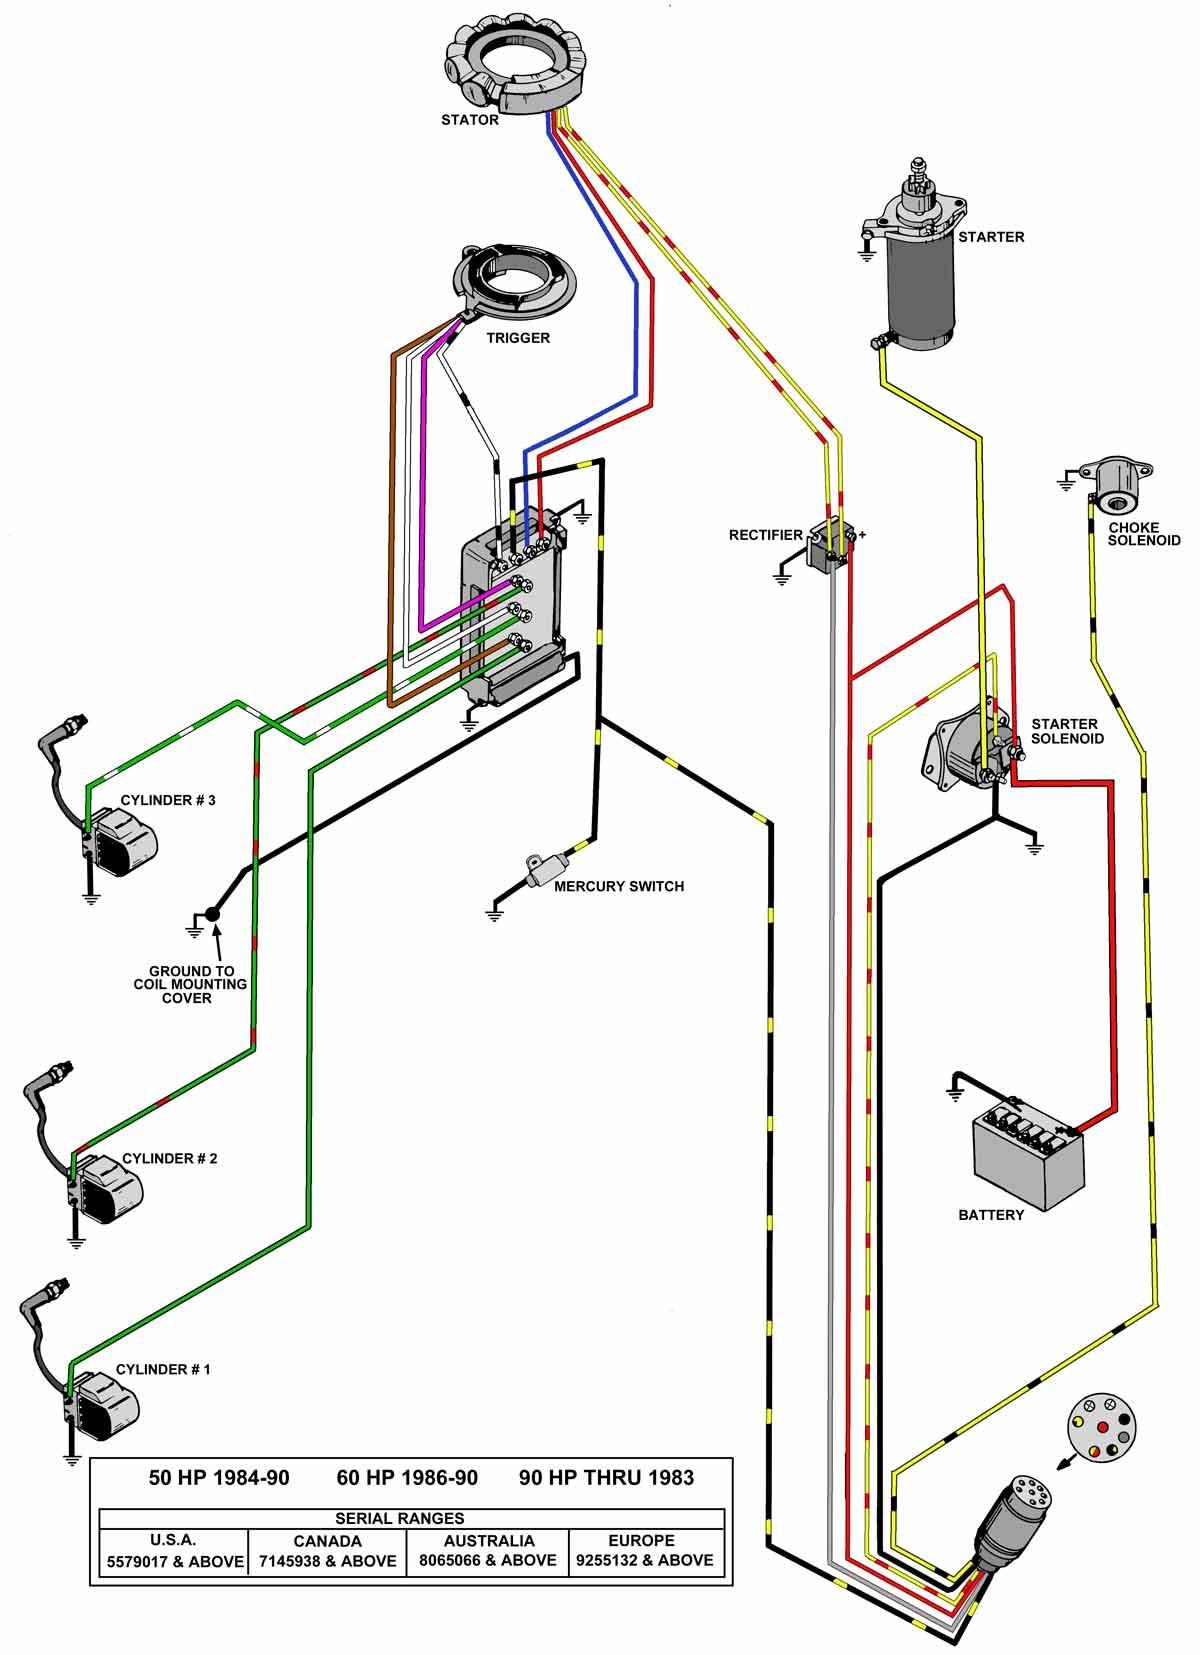 Mercury Wiring Diagrams | Wiring Diagram on electronic ignition diagram, chris craft exhaust, 360 ignition diagram, chris craft engine, chris craft timing gear diagram, chris craft parts, gas meter installation diagram, whatsup com diagram, 7.4 mercruiser engine diagram, 3 liter mercruiser engine diagram, chris craft brochure, chris craft constellation history, fisher lighting diagram, chris craft accessories,